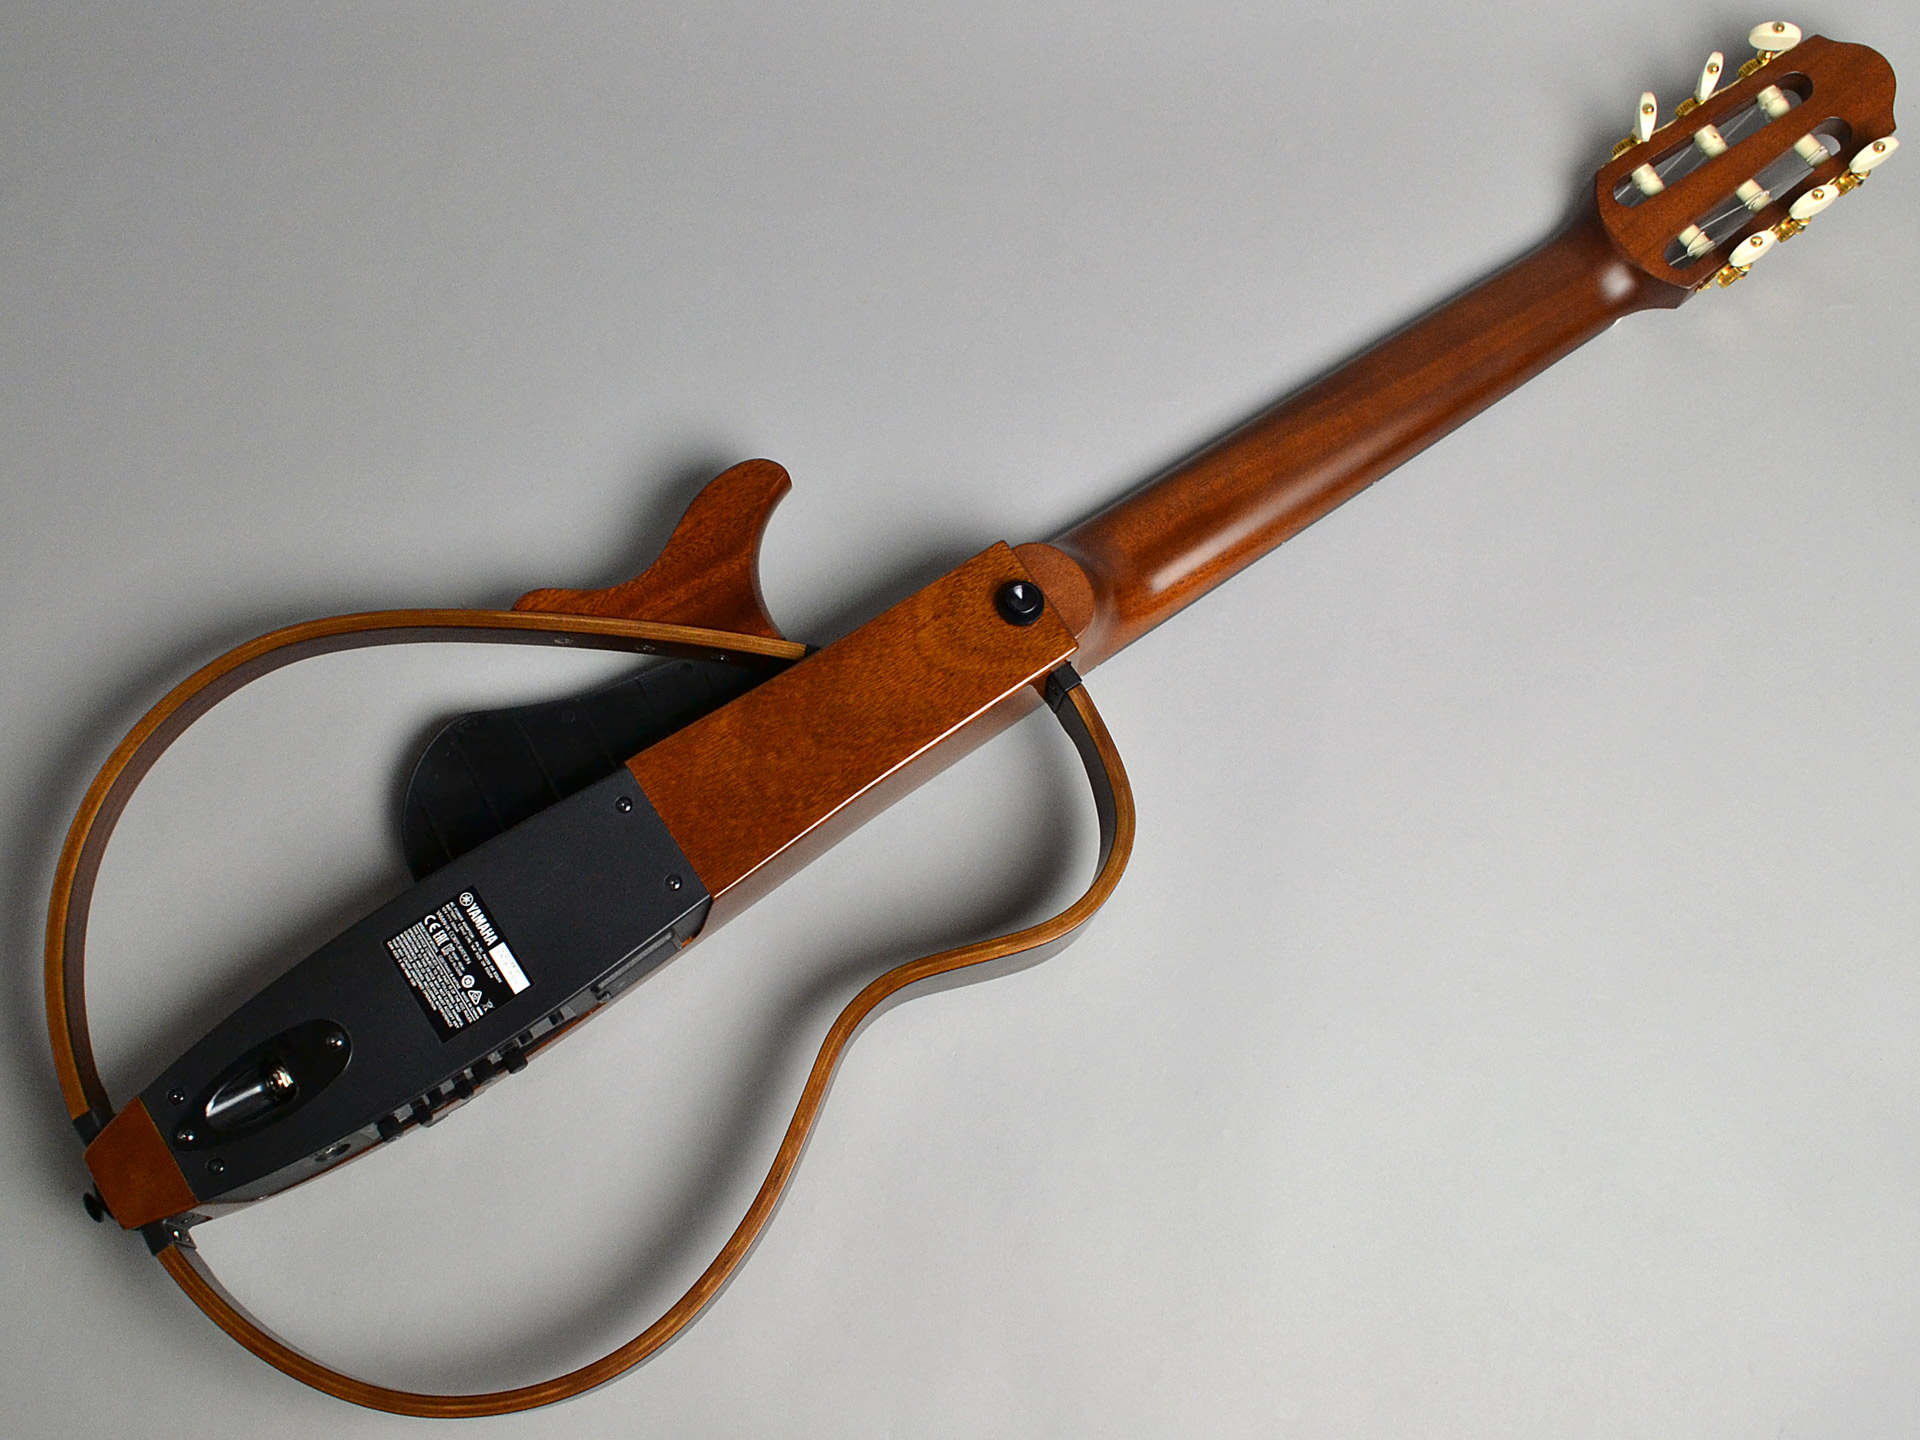 SLG200NW(サイレントギター)の全体画像(縦)